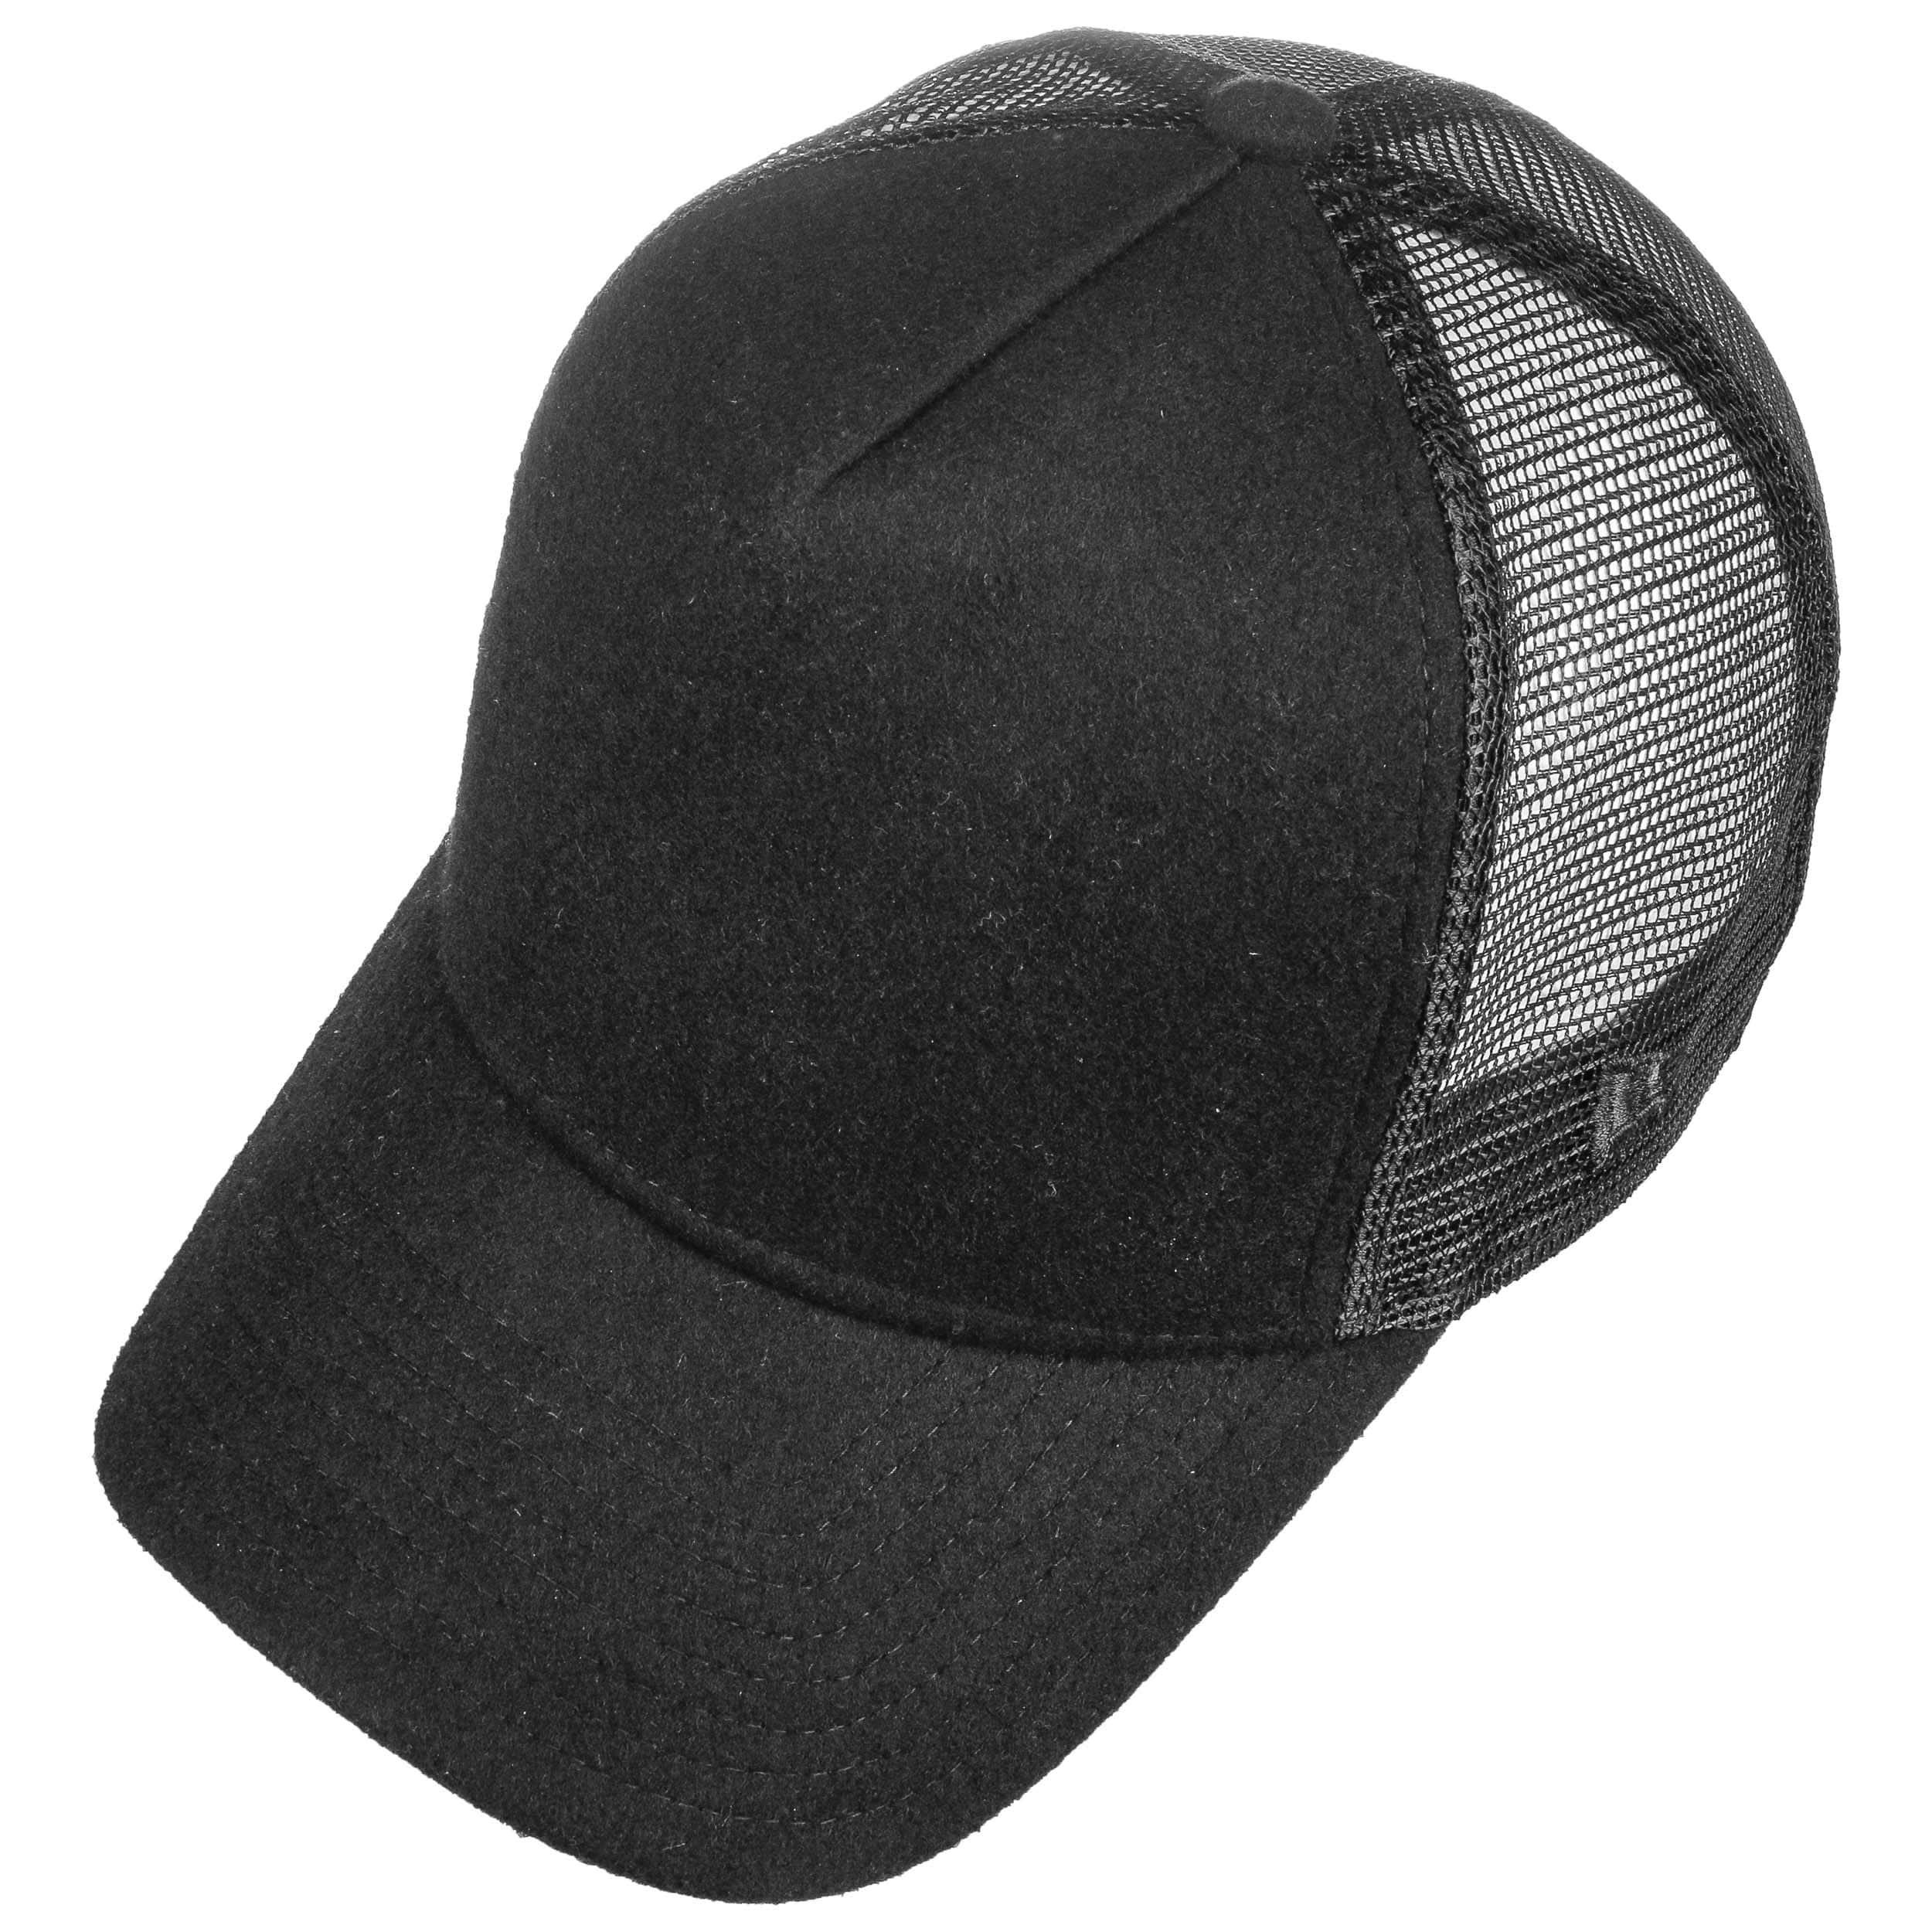 Gorra Trucker Winter Melton by New Era - Gorras - sombreroshop.es f6e8a9a0b89